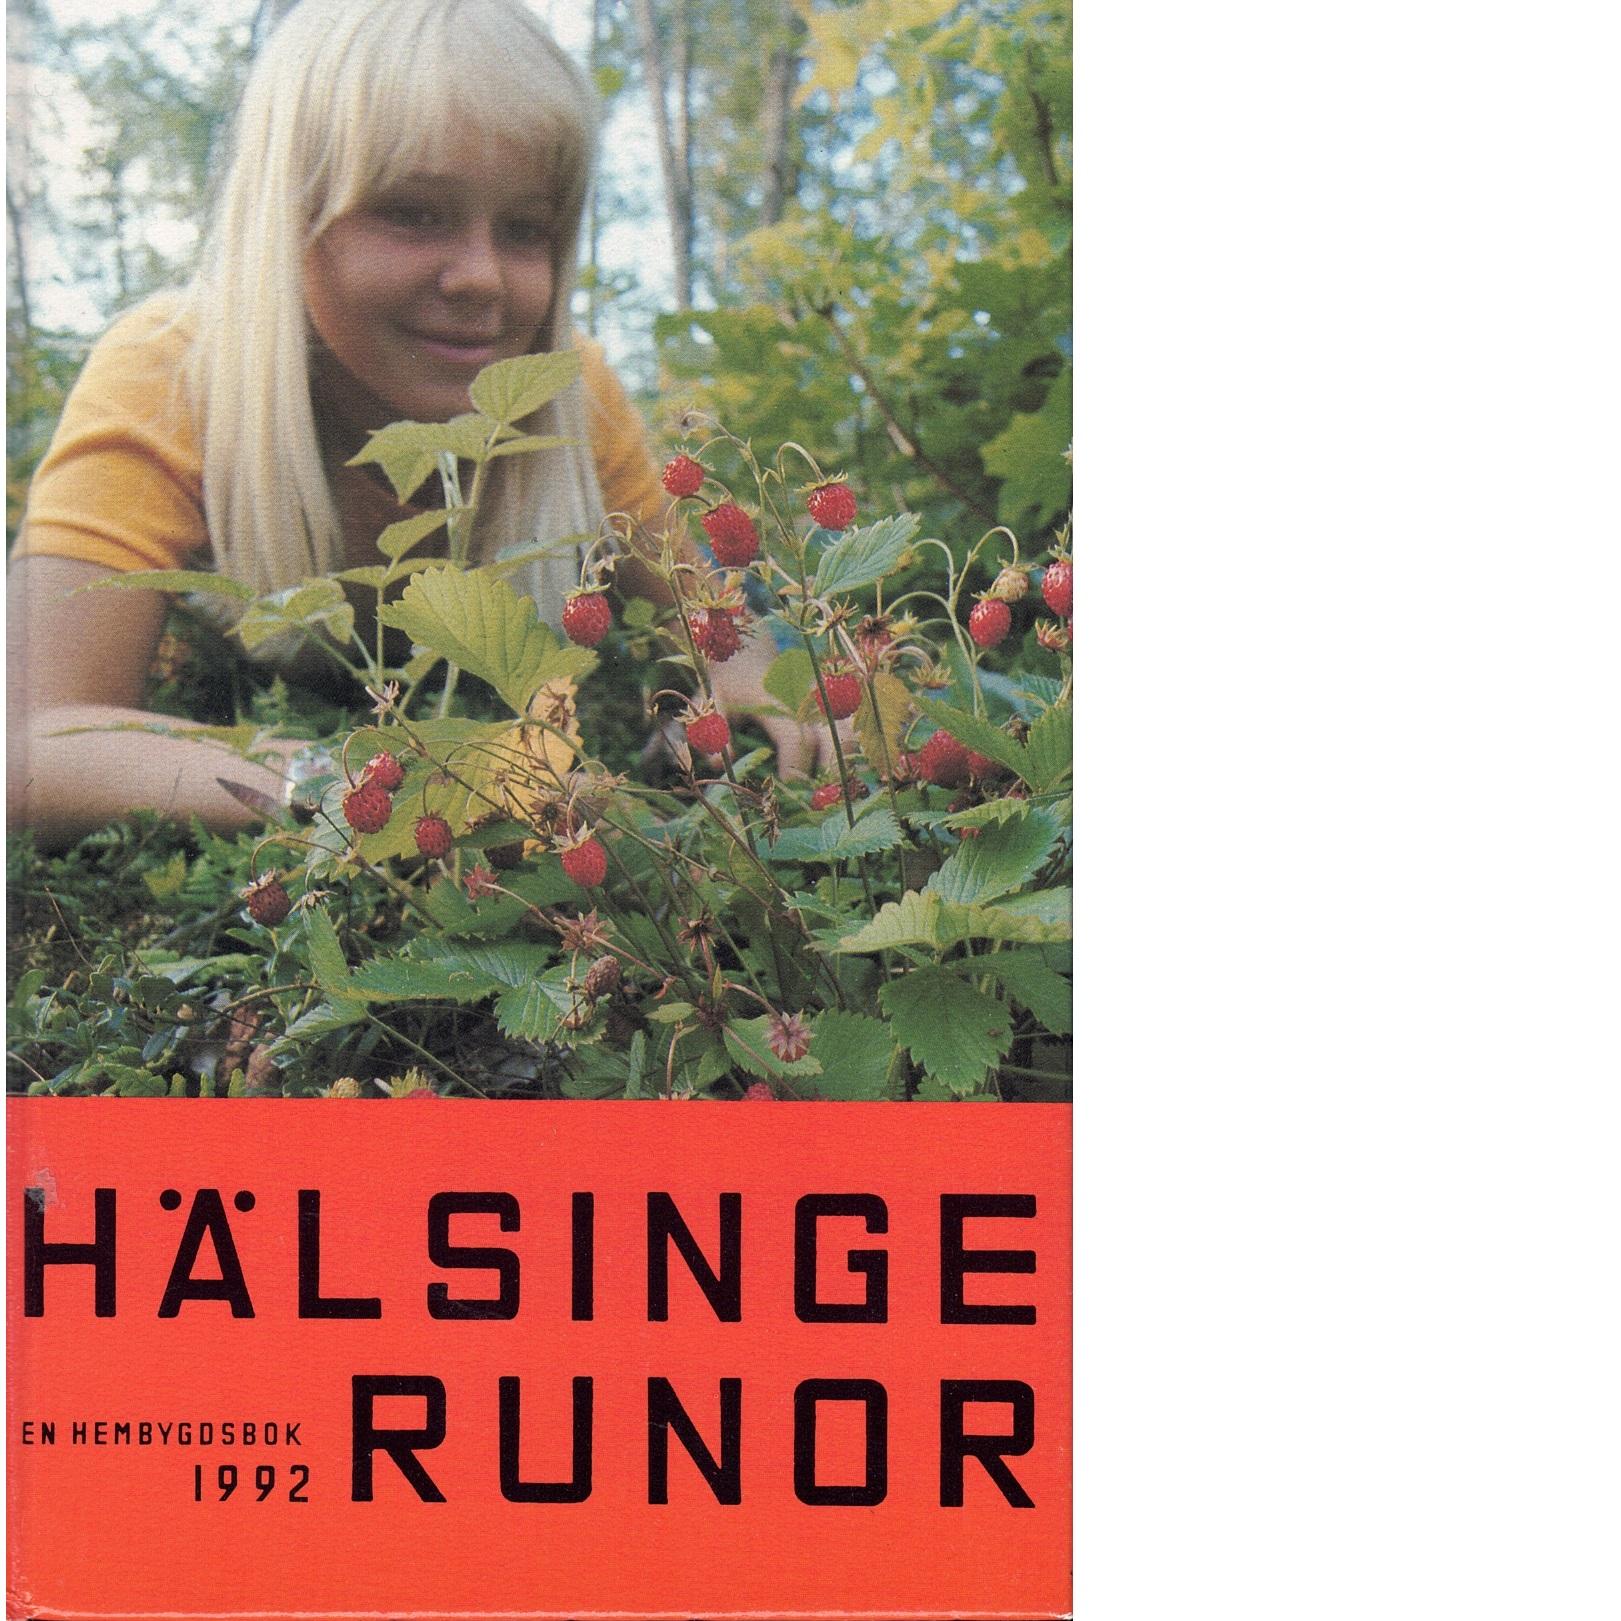 Hälsingerunor 1992 - Red.